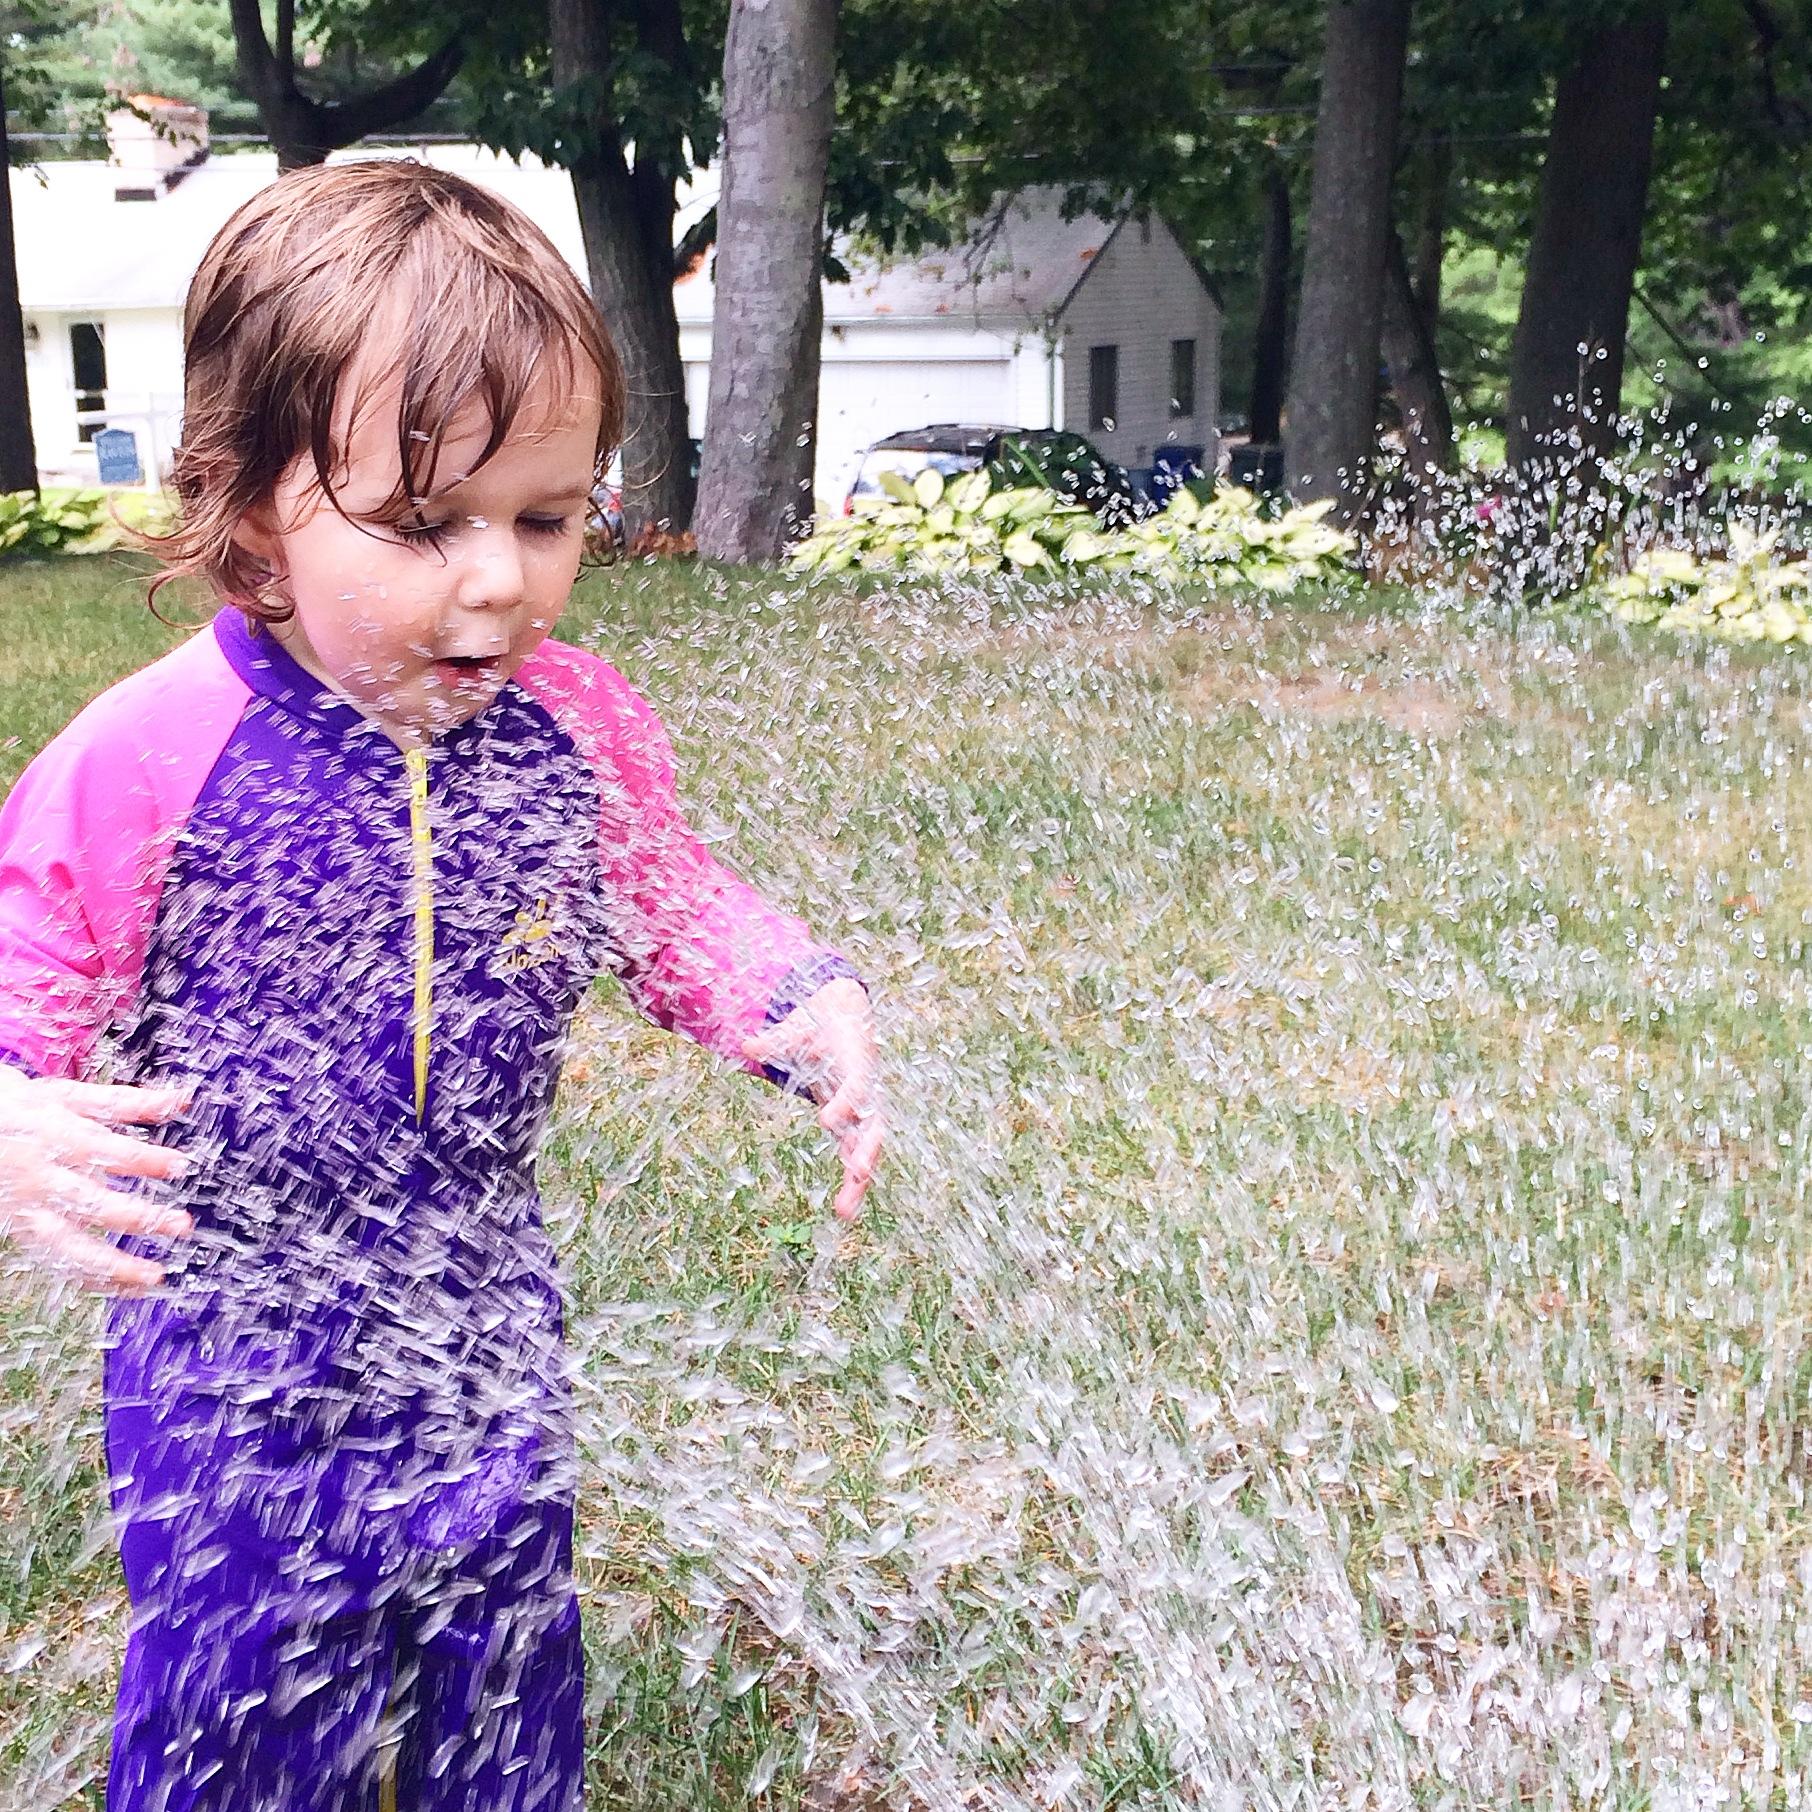 Backyard sprinkler fun taken with iPhone